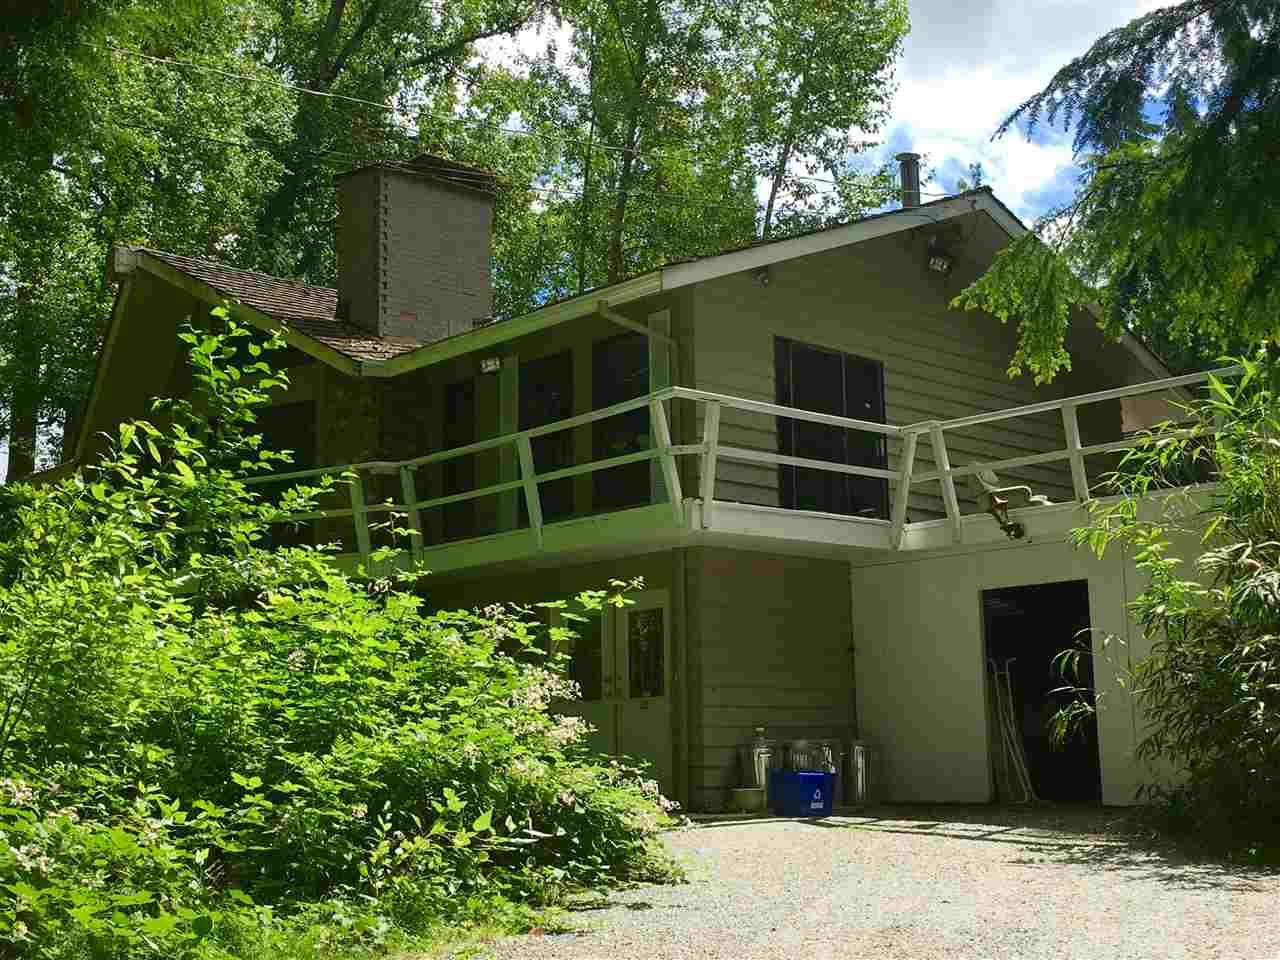 Detached at 25388 ROBERTSON CRESCENT, Langley, British Columbia. Image 1